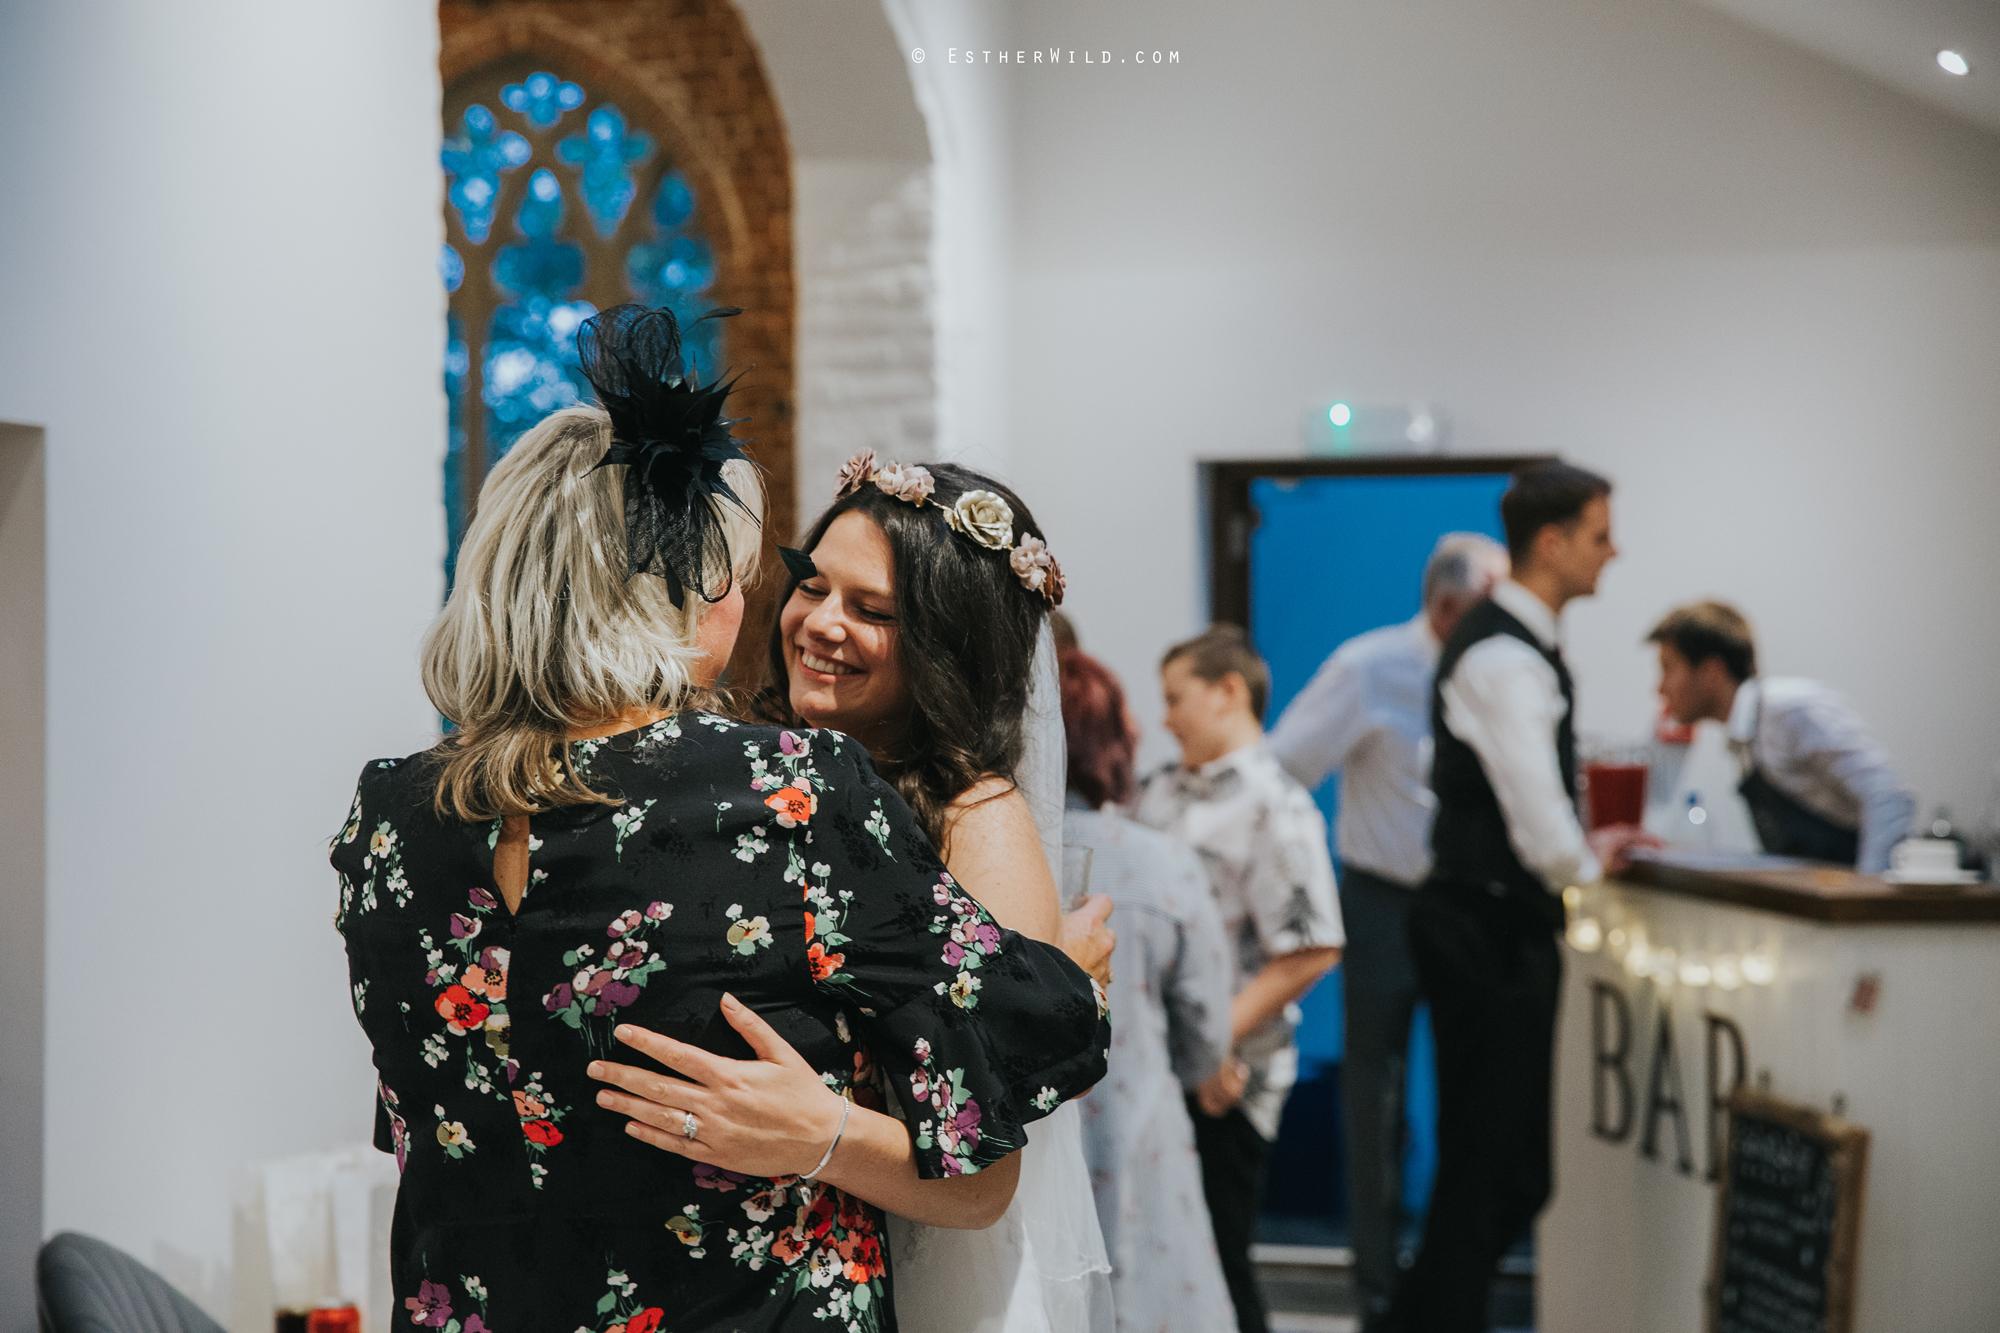 Reading_Room_Weddings_Alby_Norwich_Photographer_Esther_Wild_IMG_2586.jpg